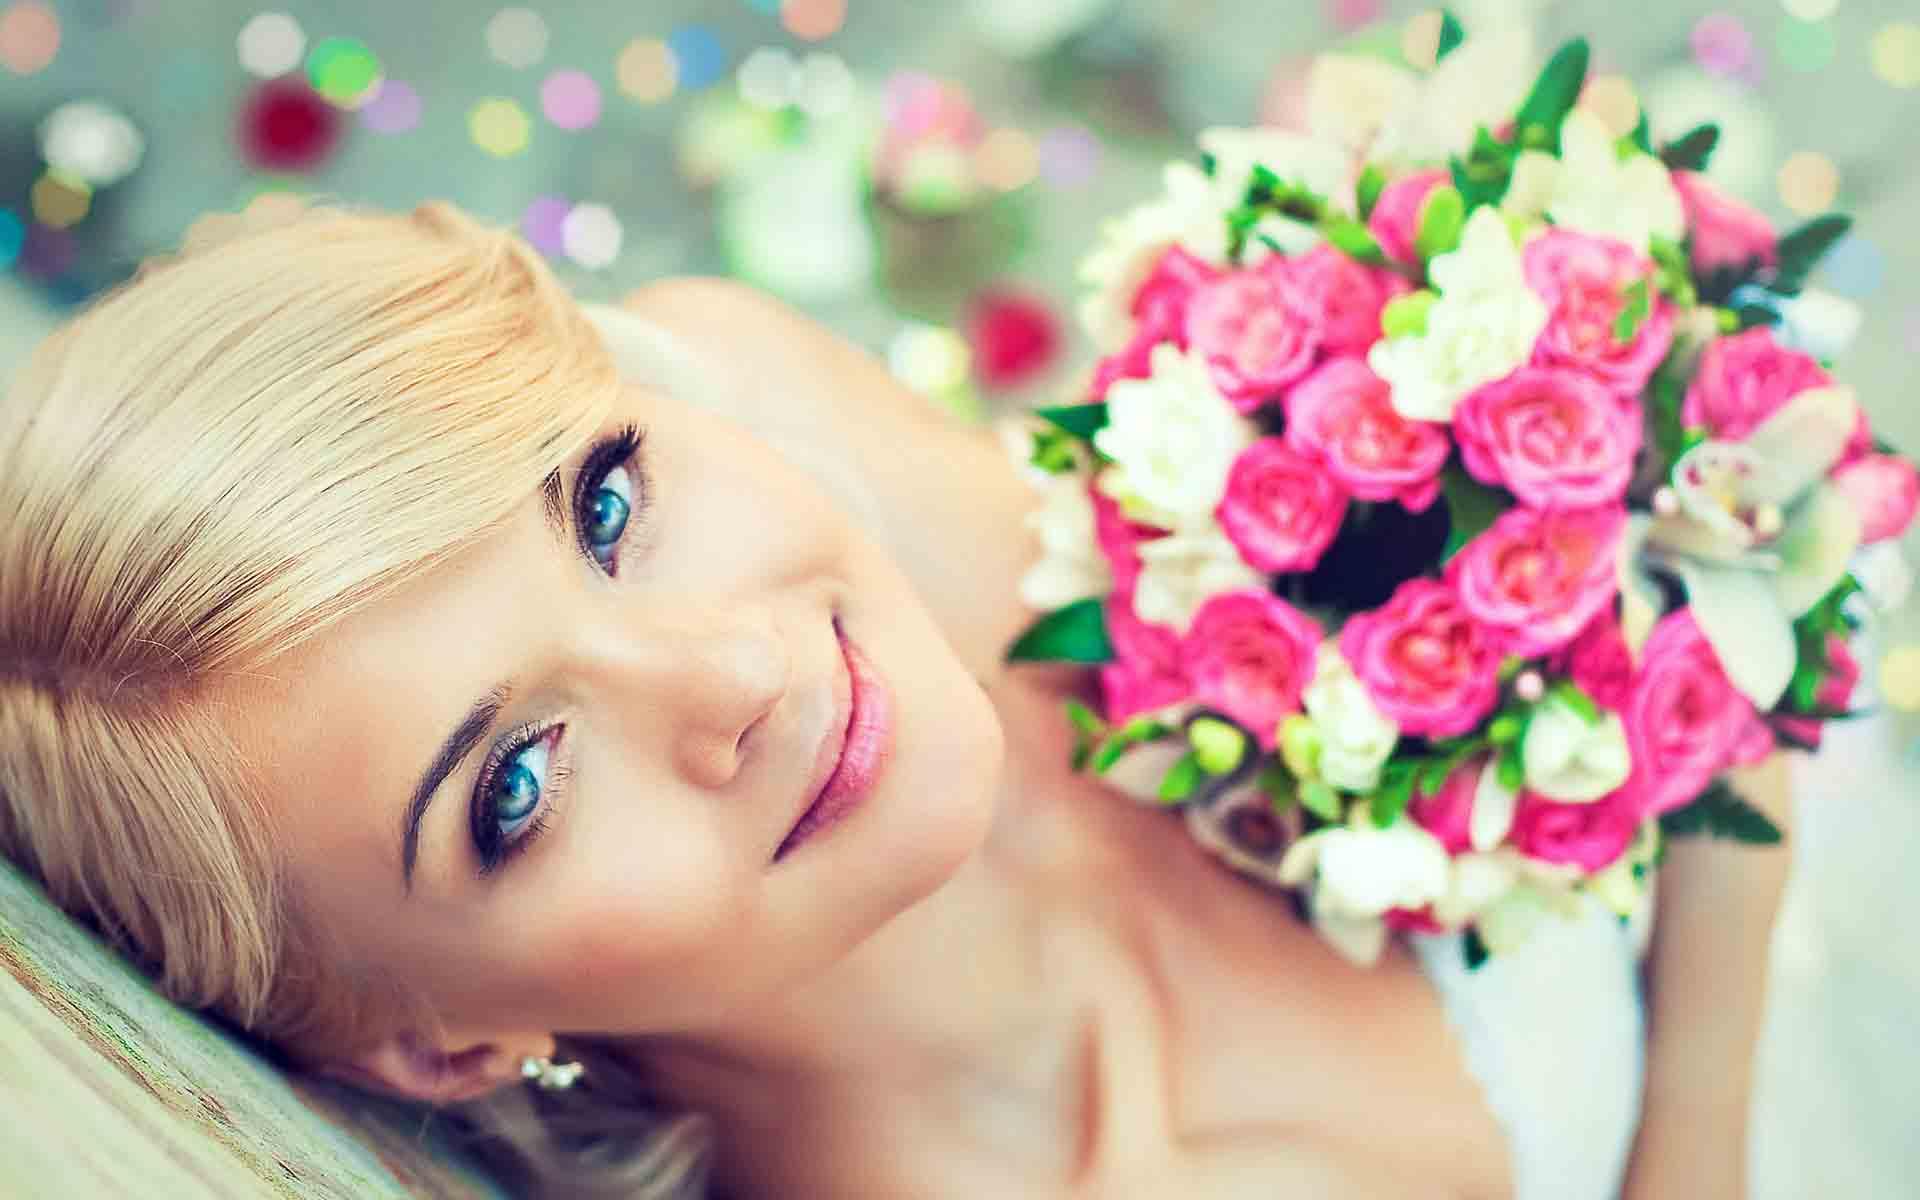 evlilik vefki 2 - Evlilik Vefki